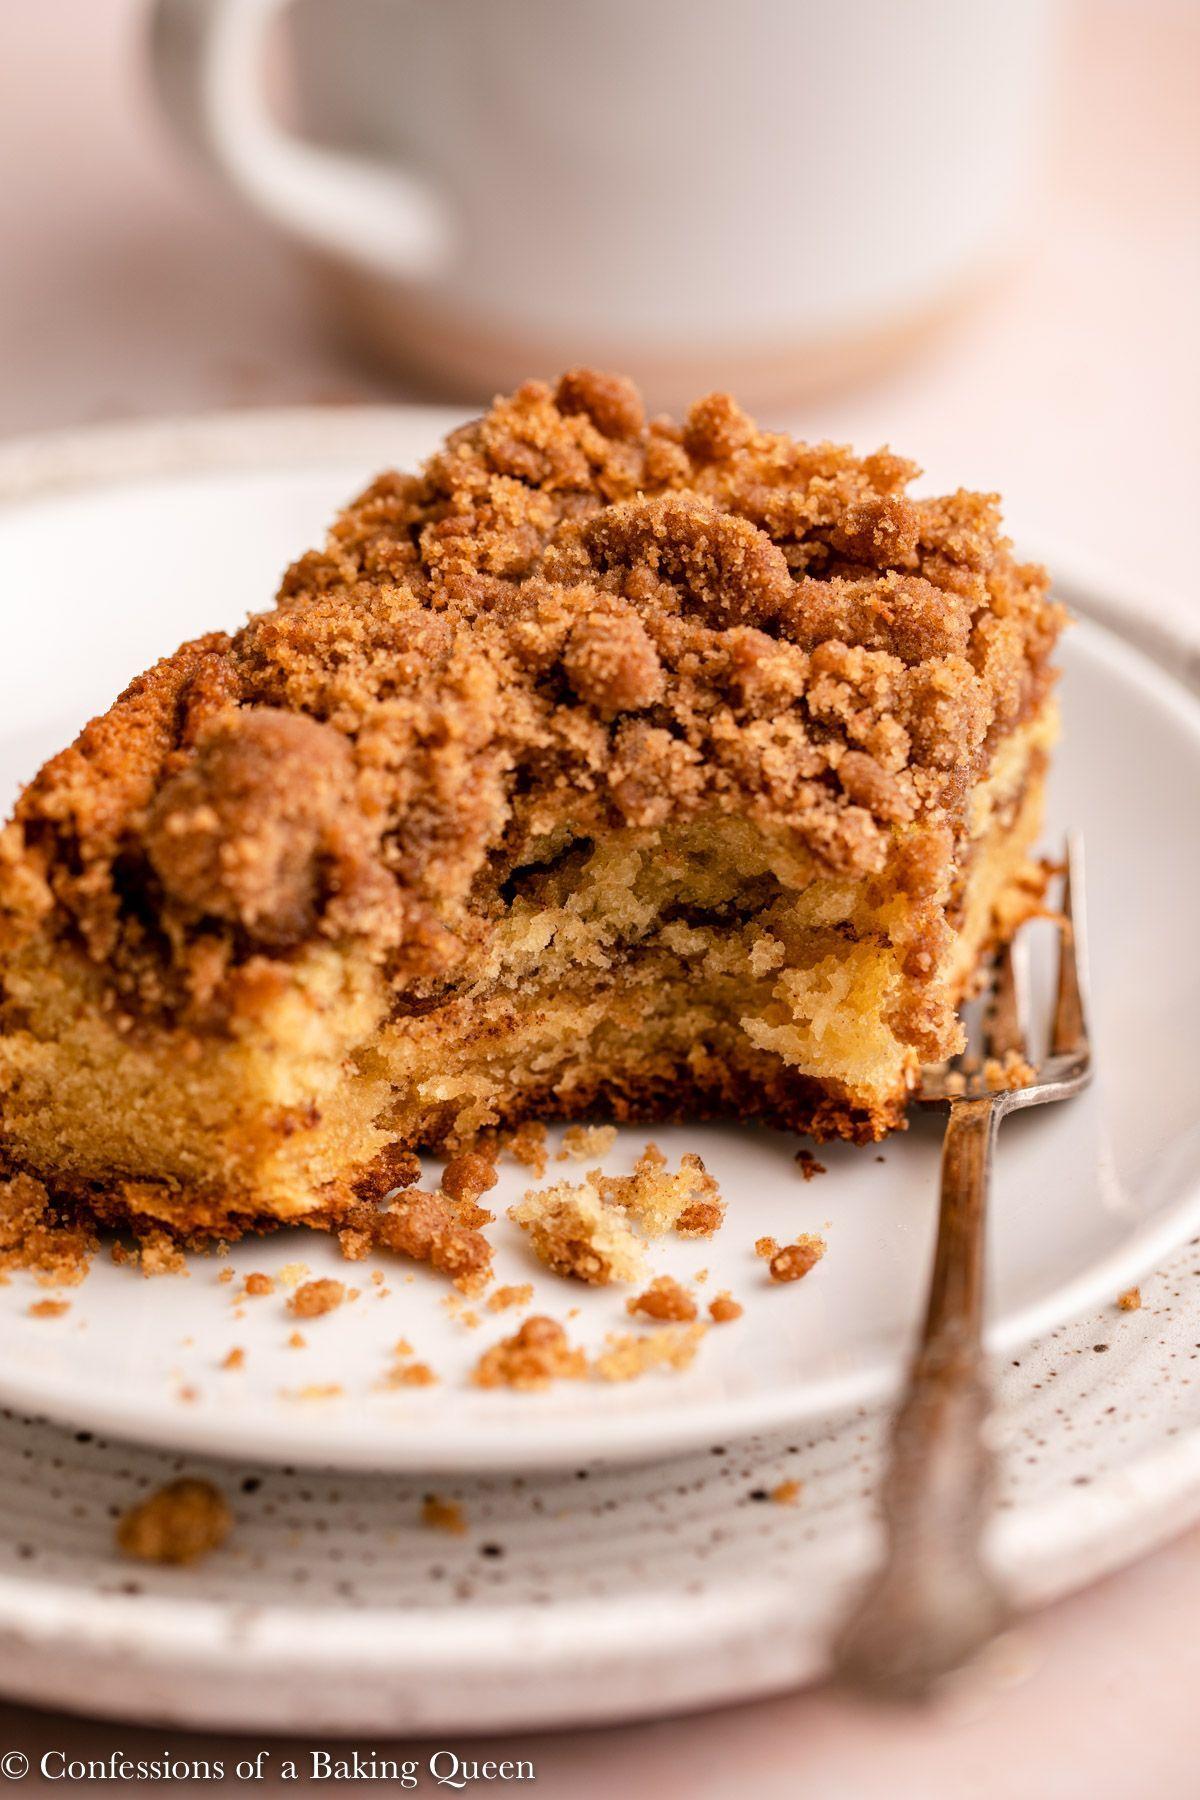 Sour Cream Coffee Cake Recipe In 2020 Sour Cream Coffee Cake Coffee Cake Coffee Cake Recipes